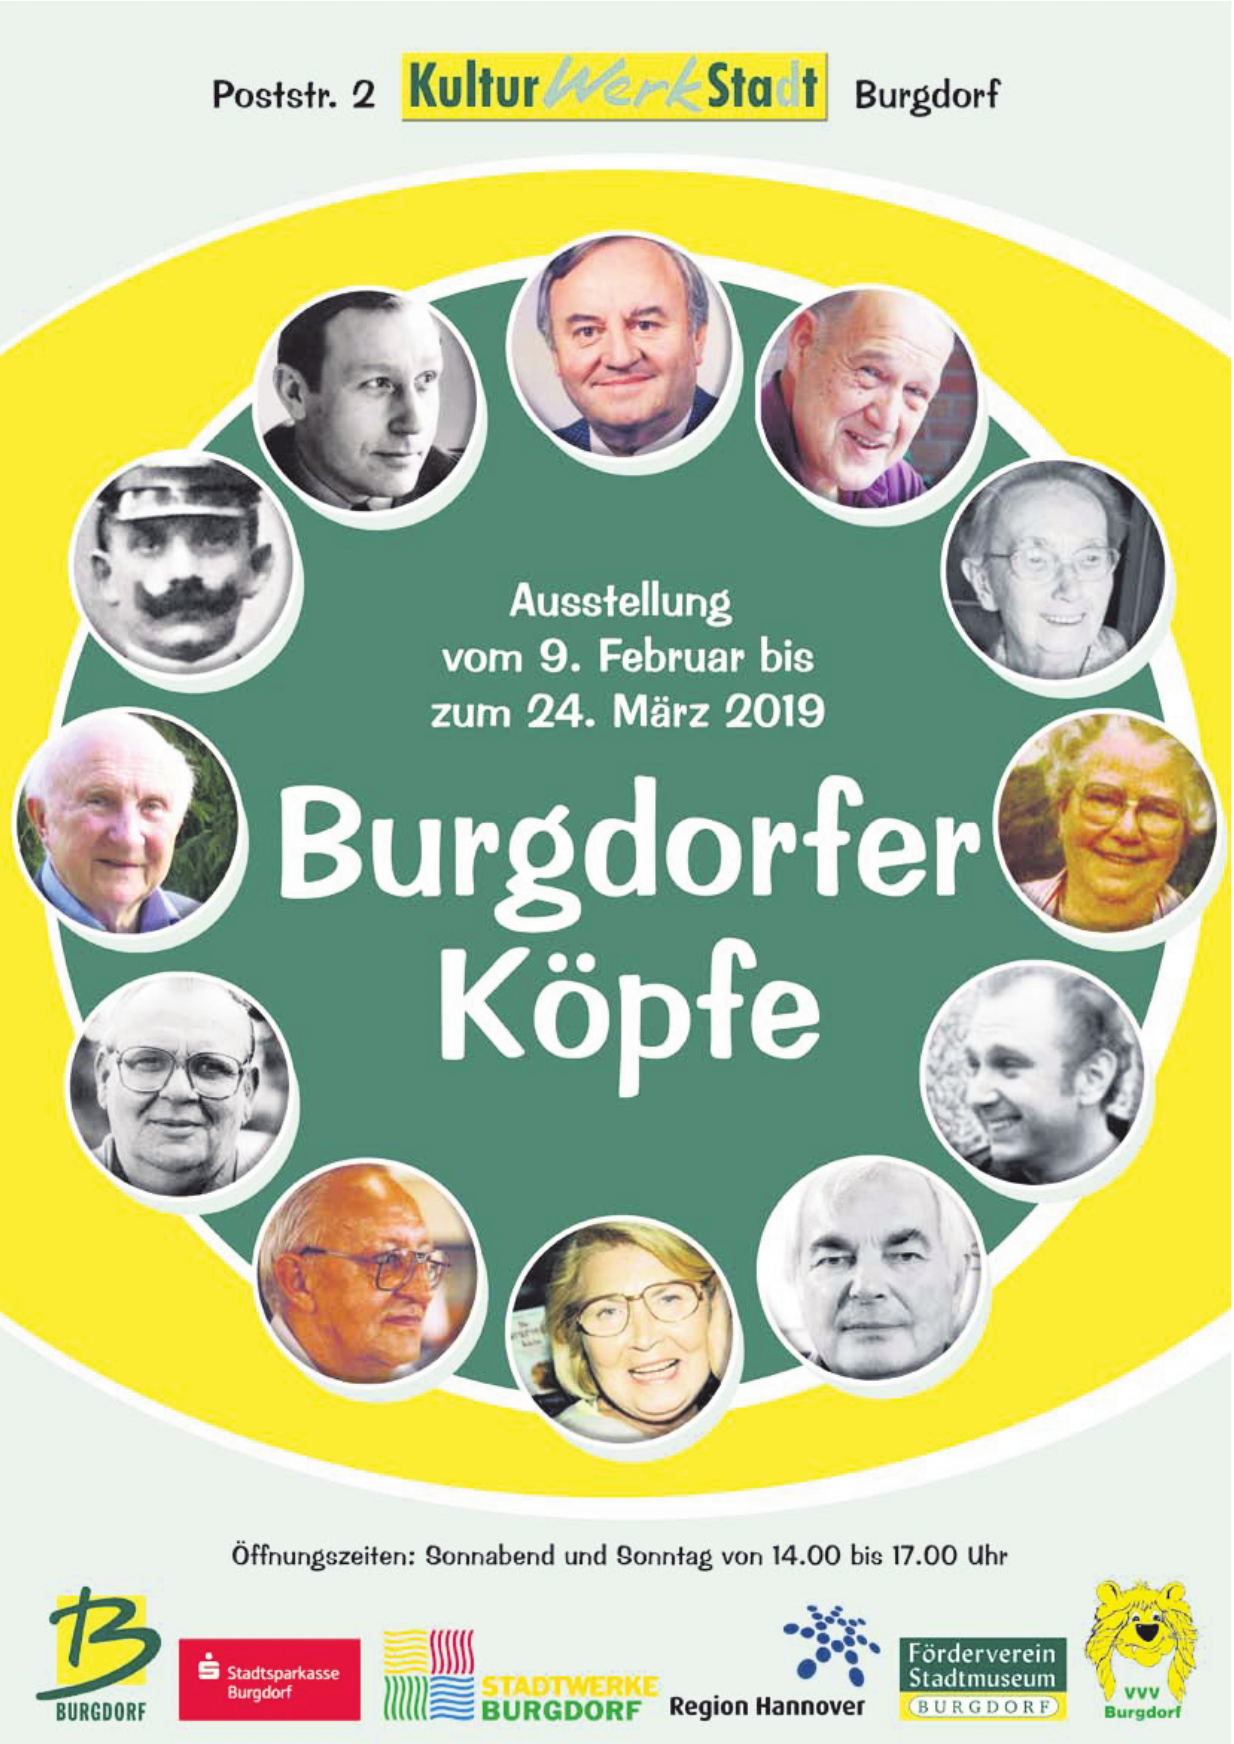 Burgdorfer Köpfe